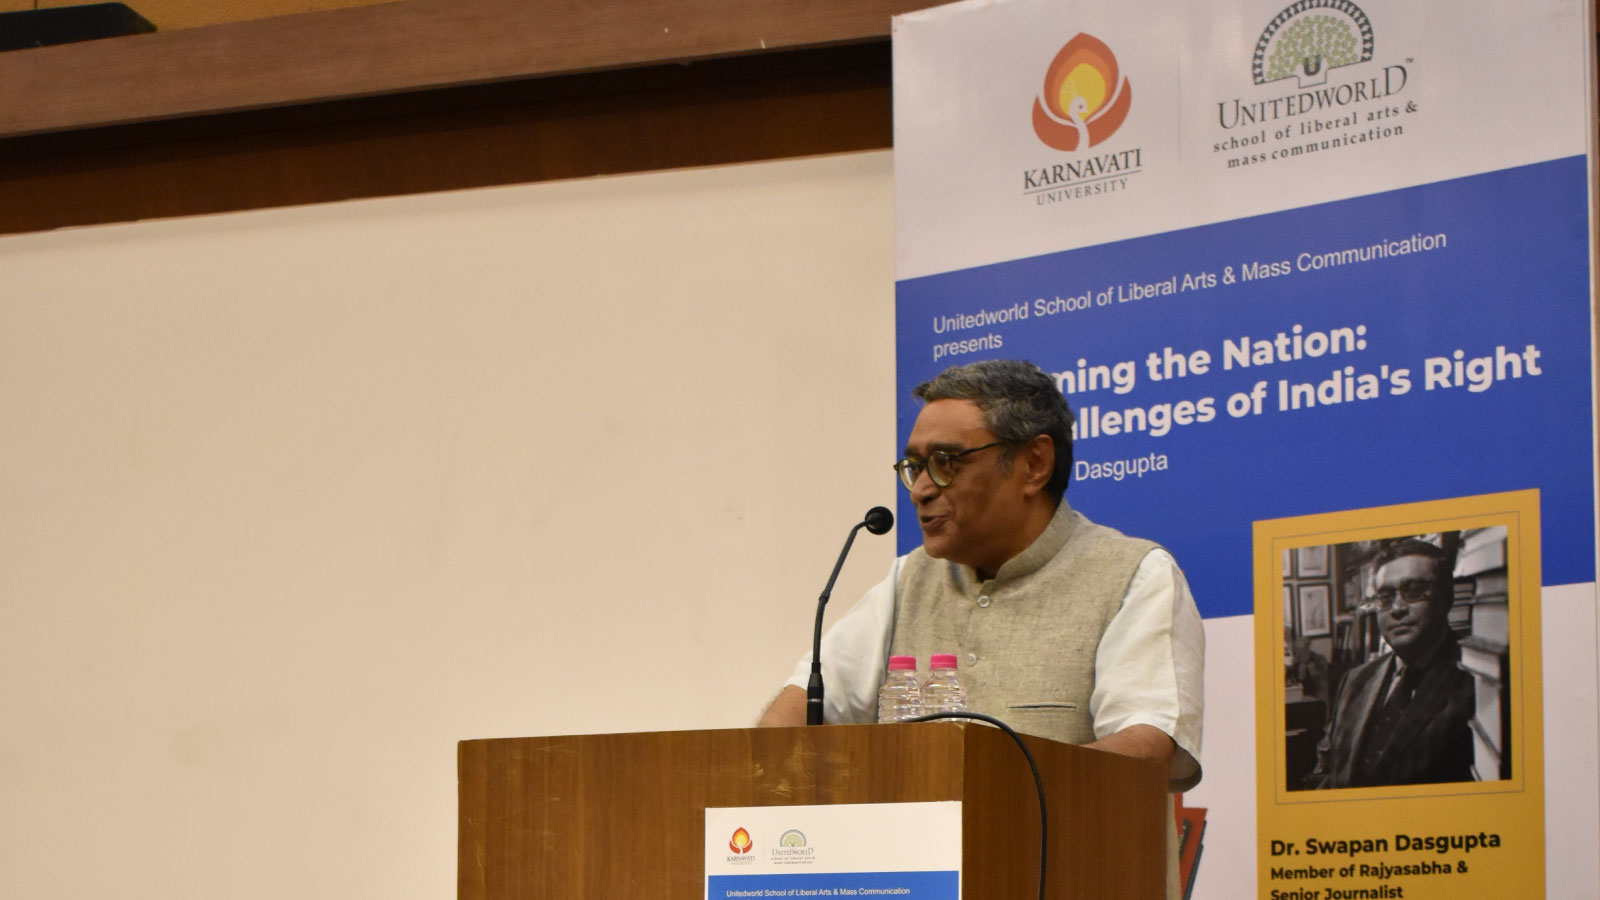 Dr. Swapan Dasgupta Image